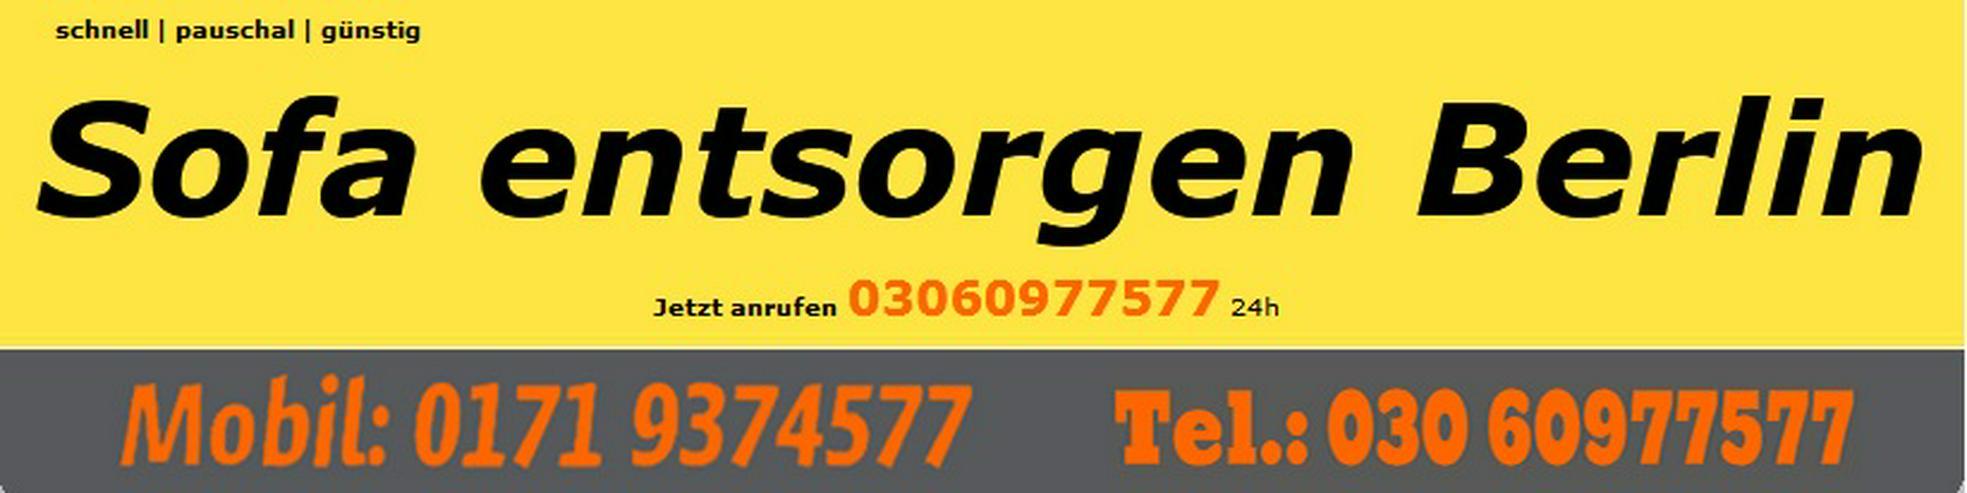 Sofa entsorgen Berlin - Haushaltshilfe & Reinigung - Bild 1